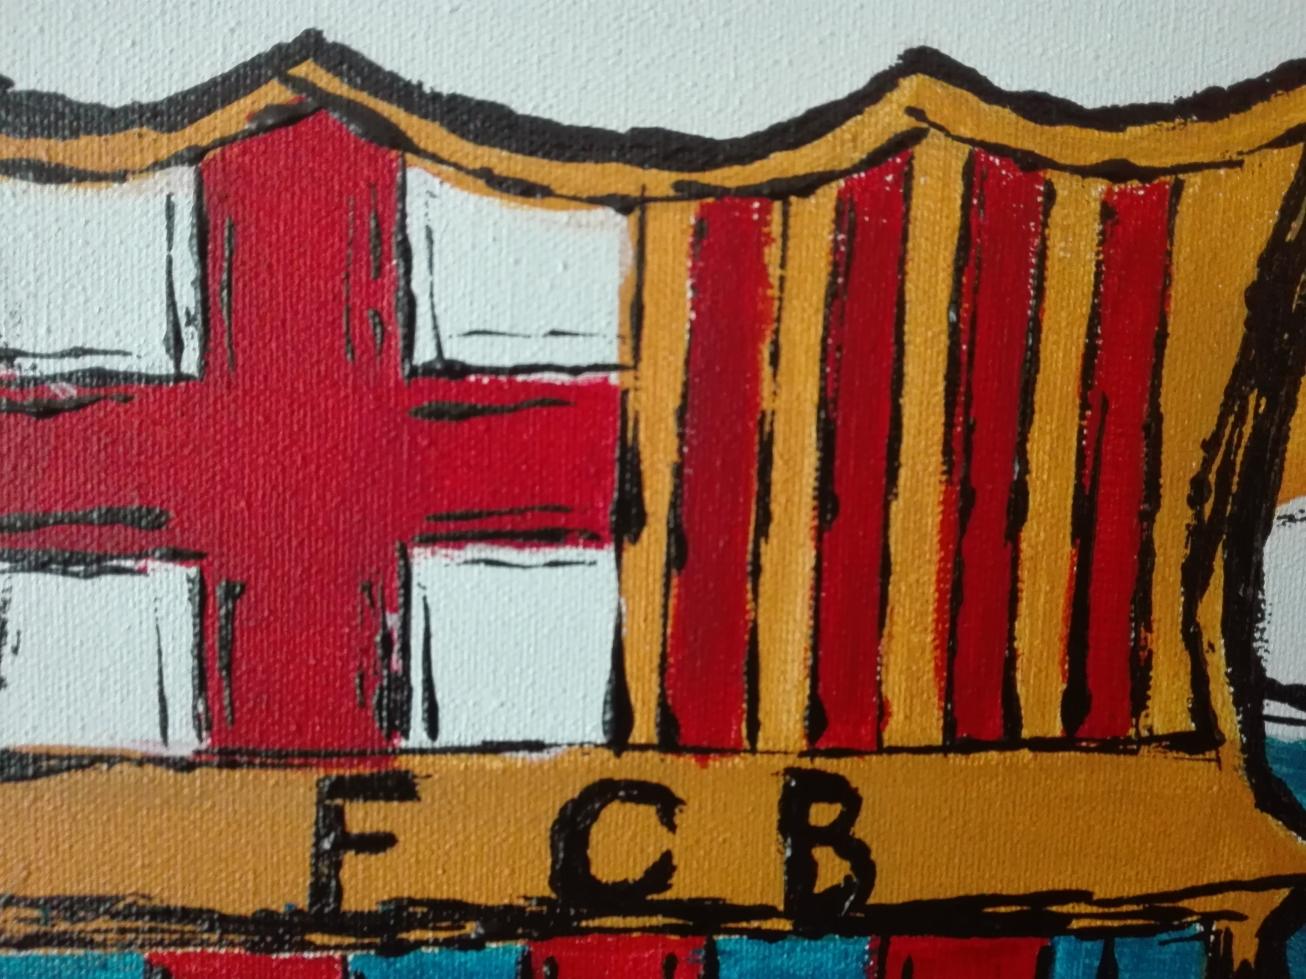 fc barcelona veb bydgoszcz akryl obraz